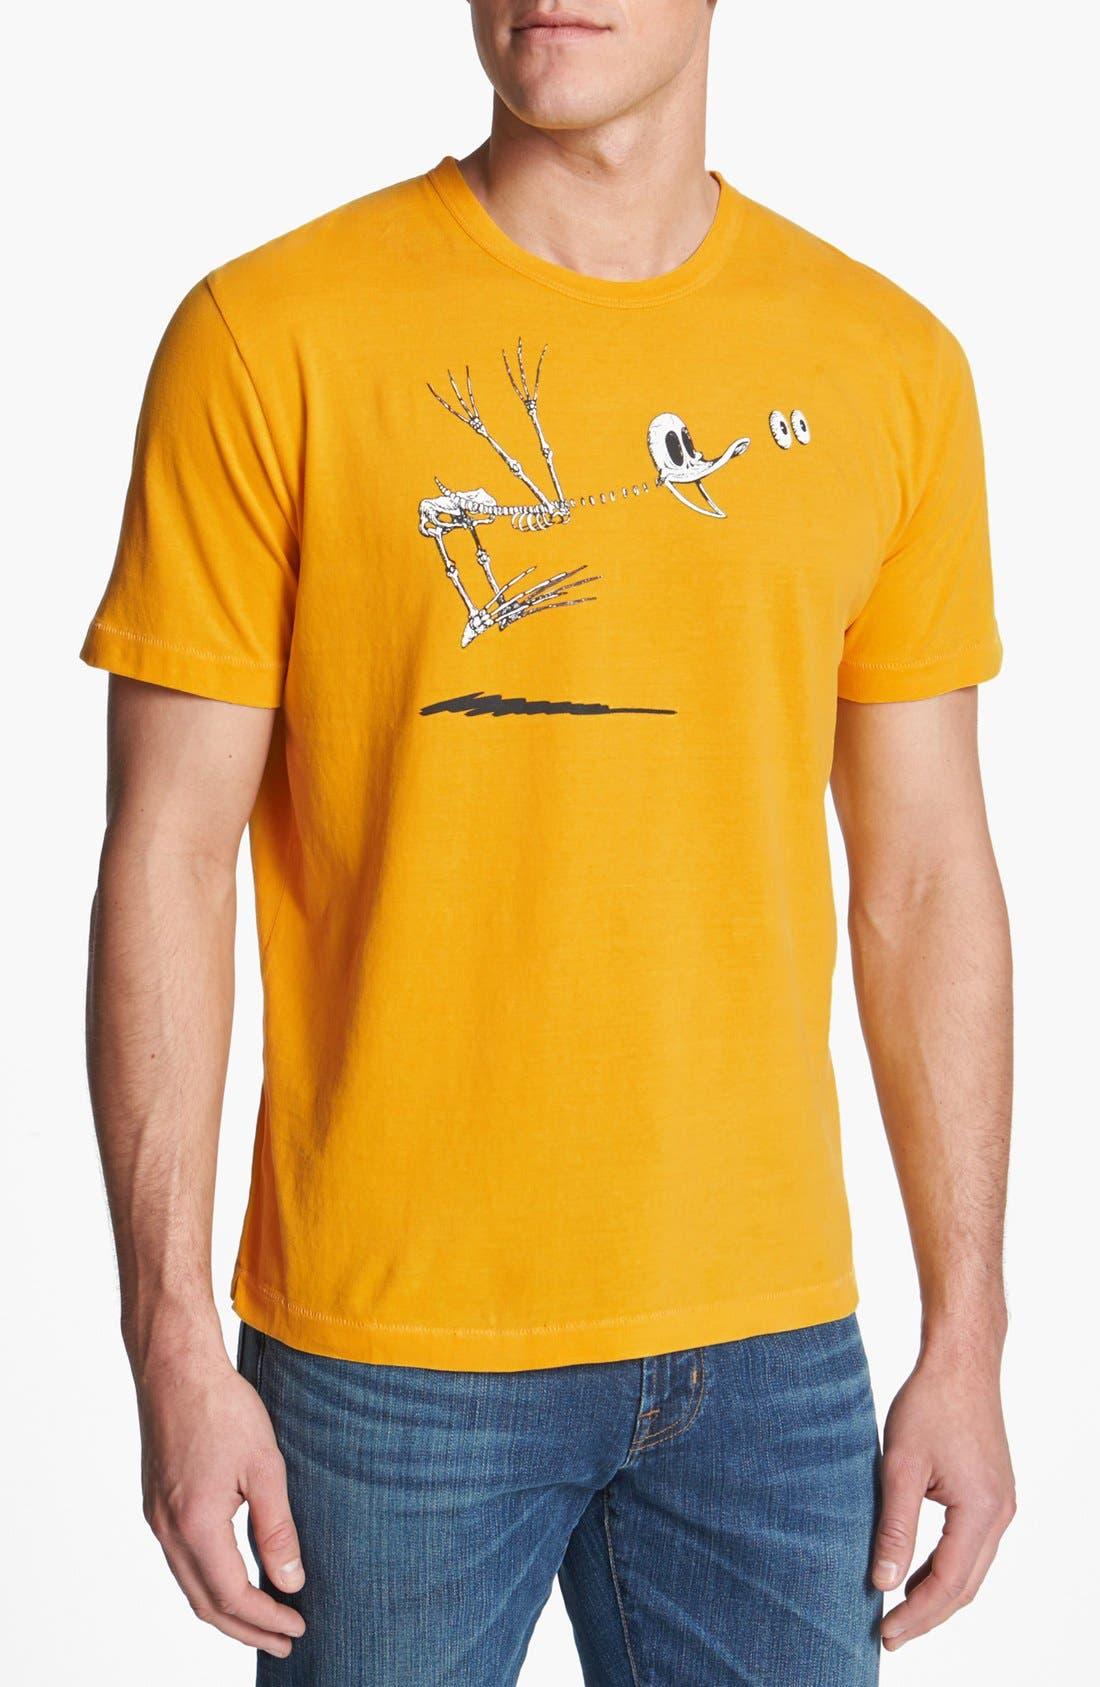 Main Image - French Connection 'Peeking Duck' T-Shirt